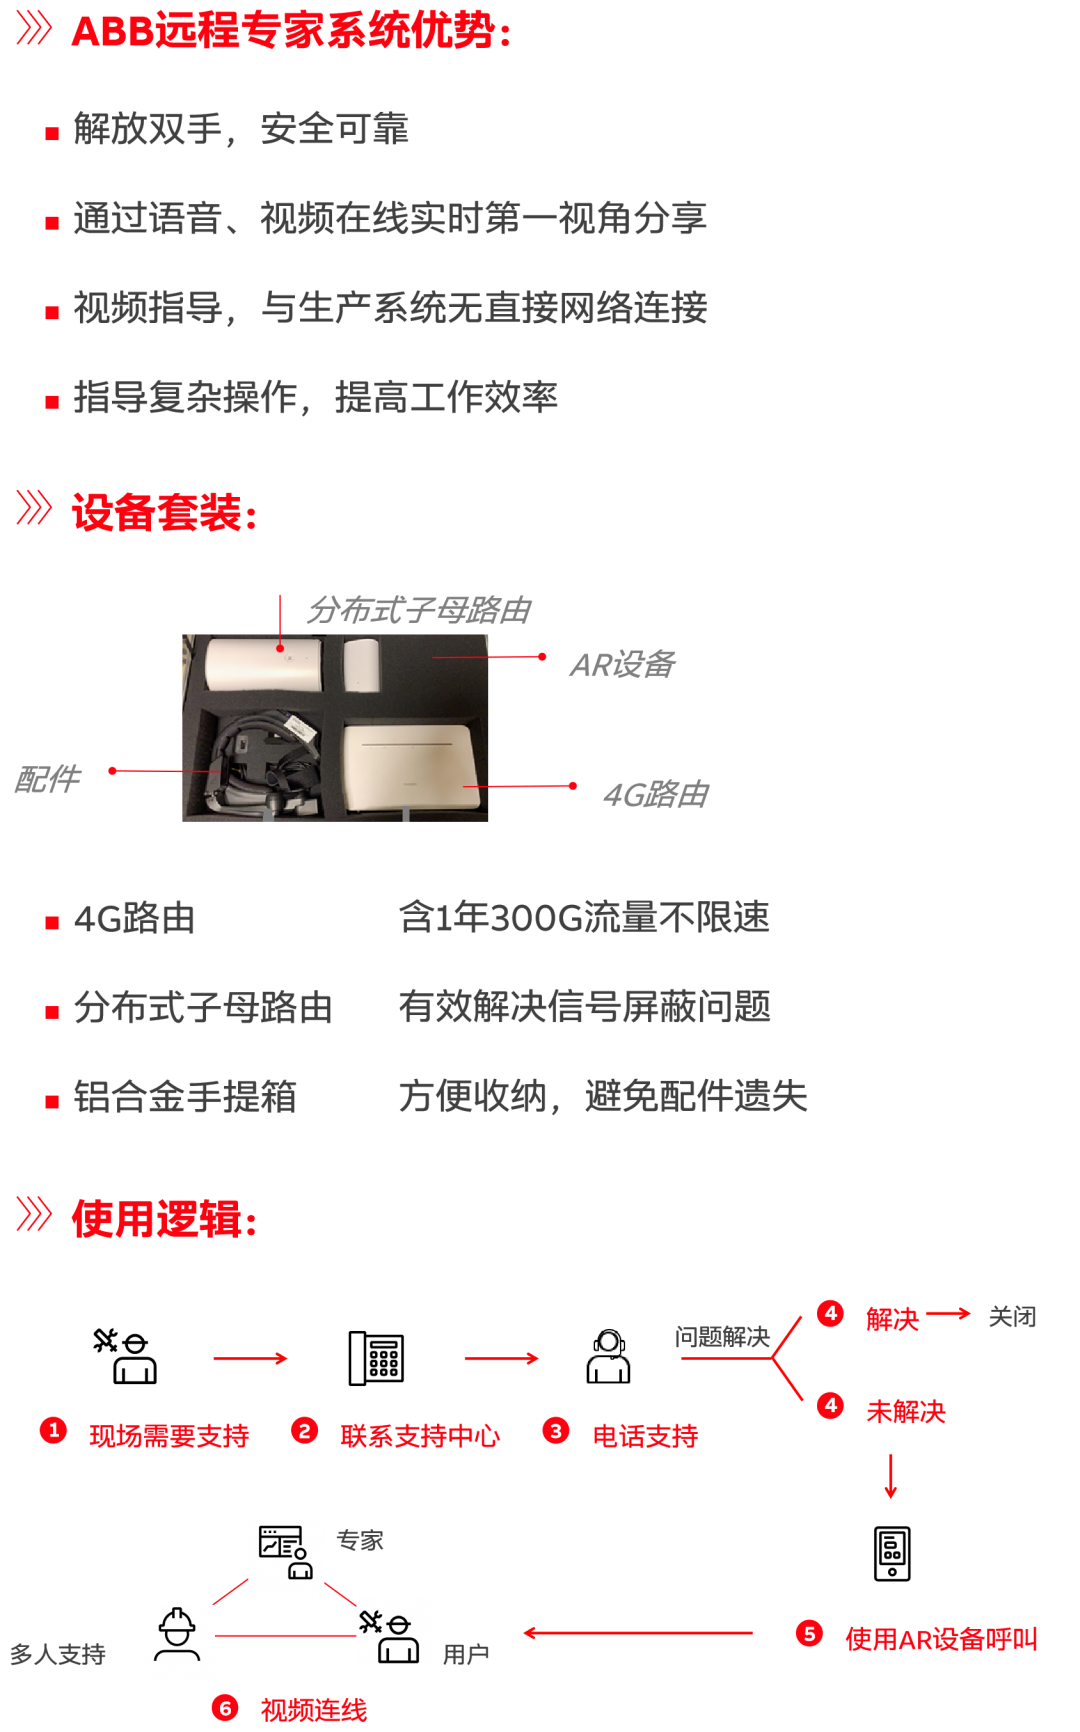 ABB远程专家系统优势.png